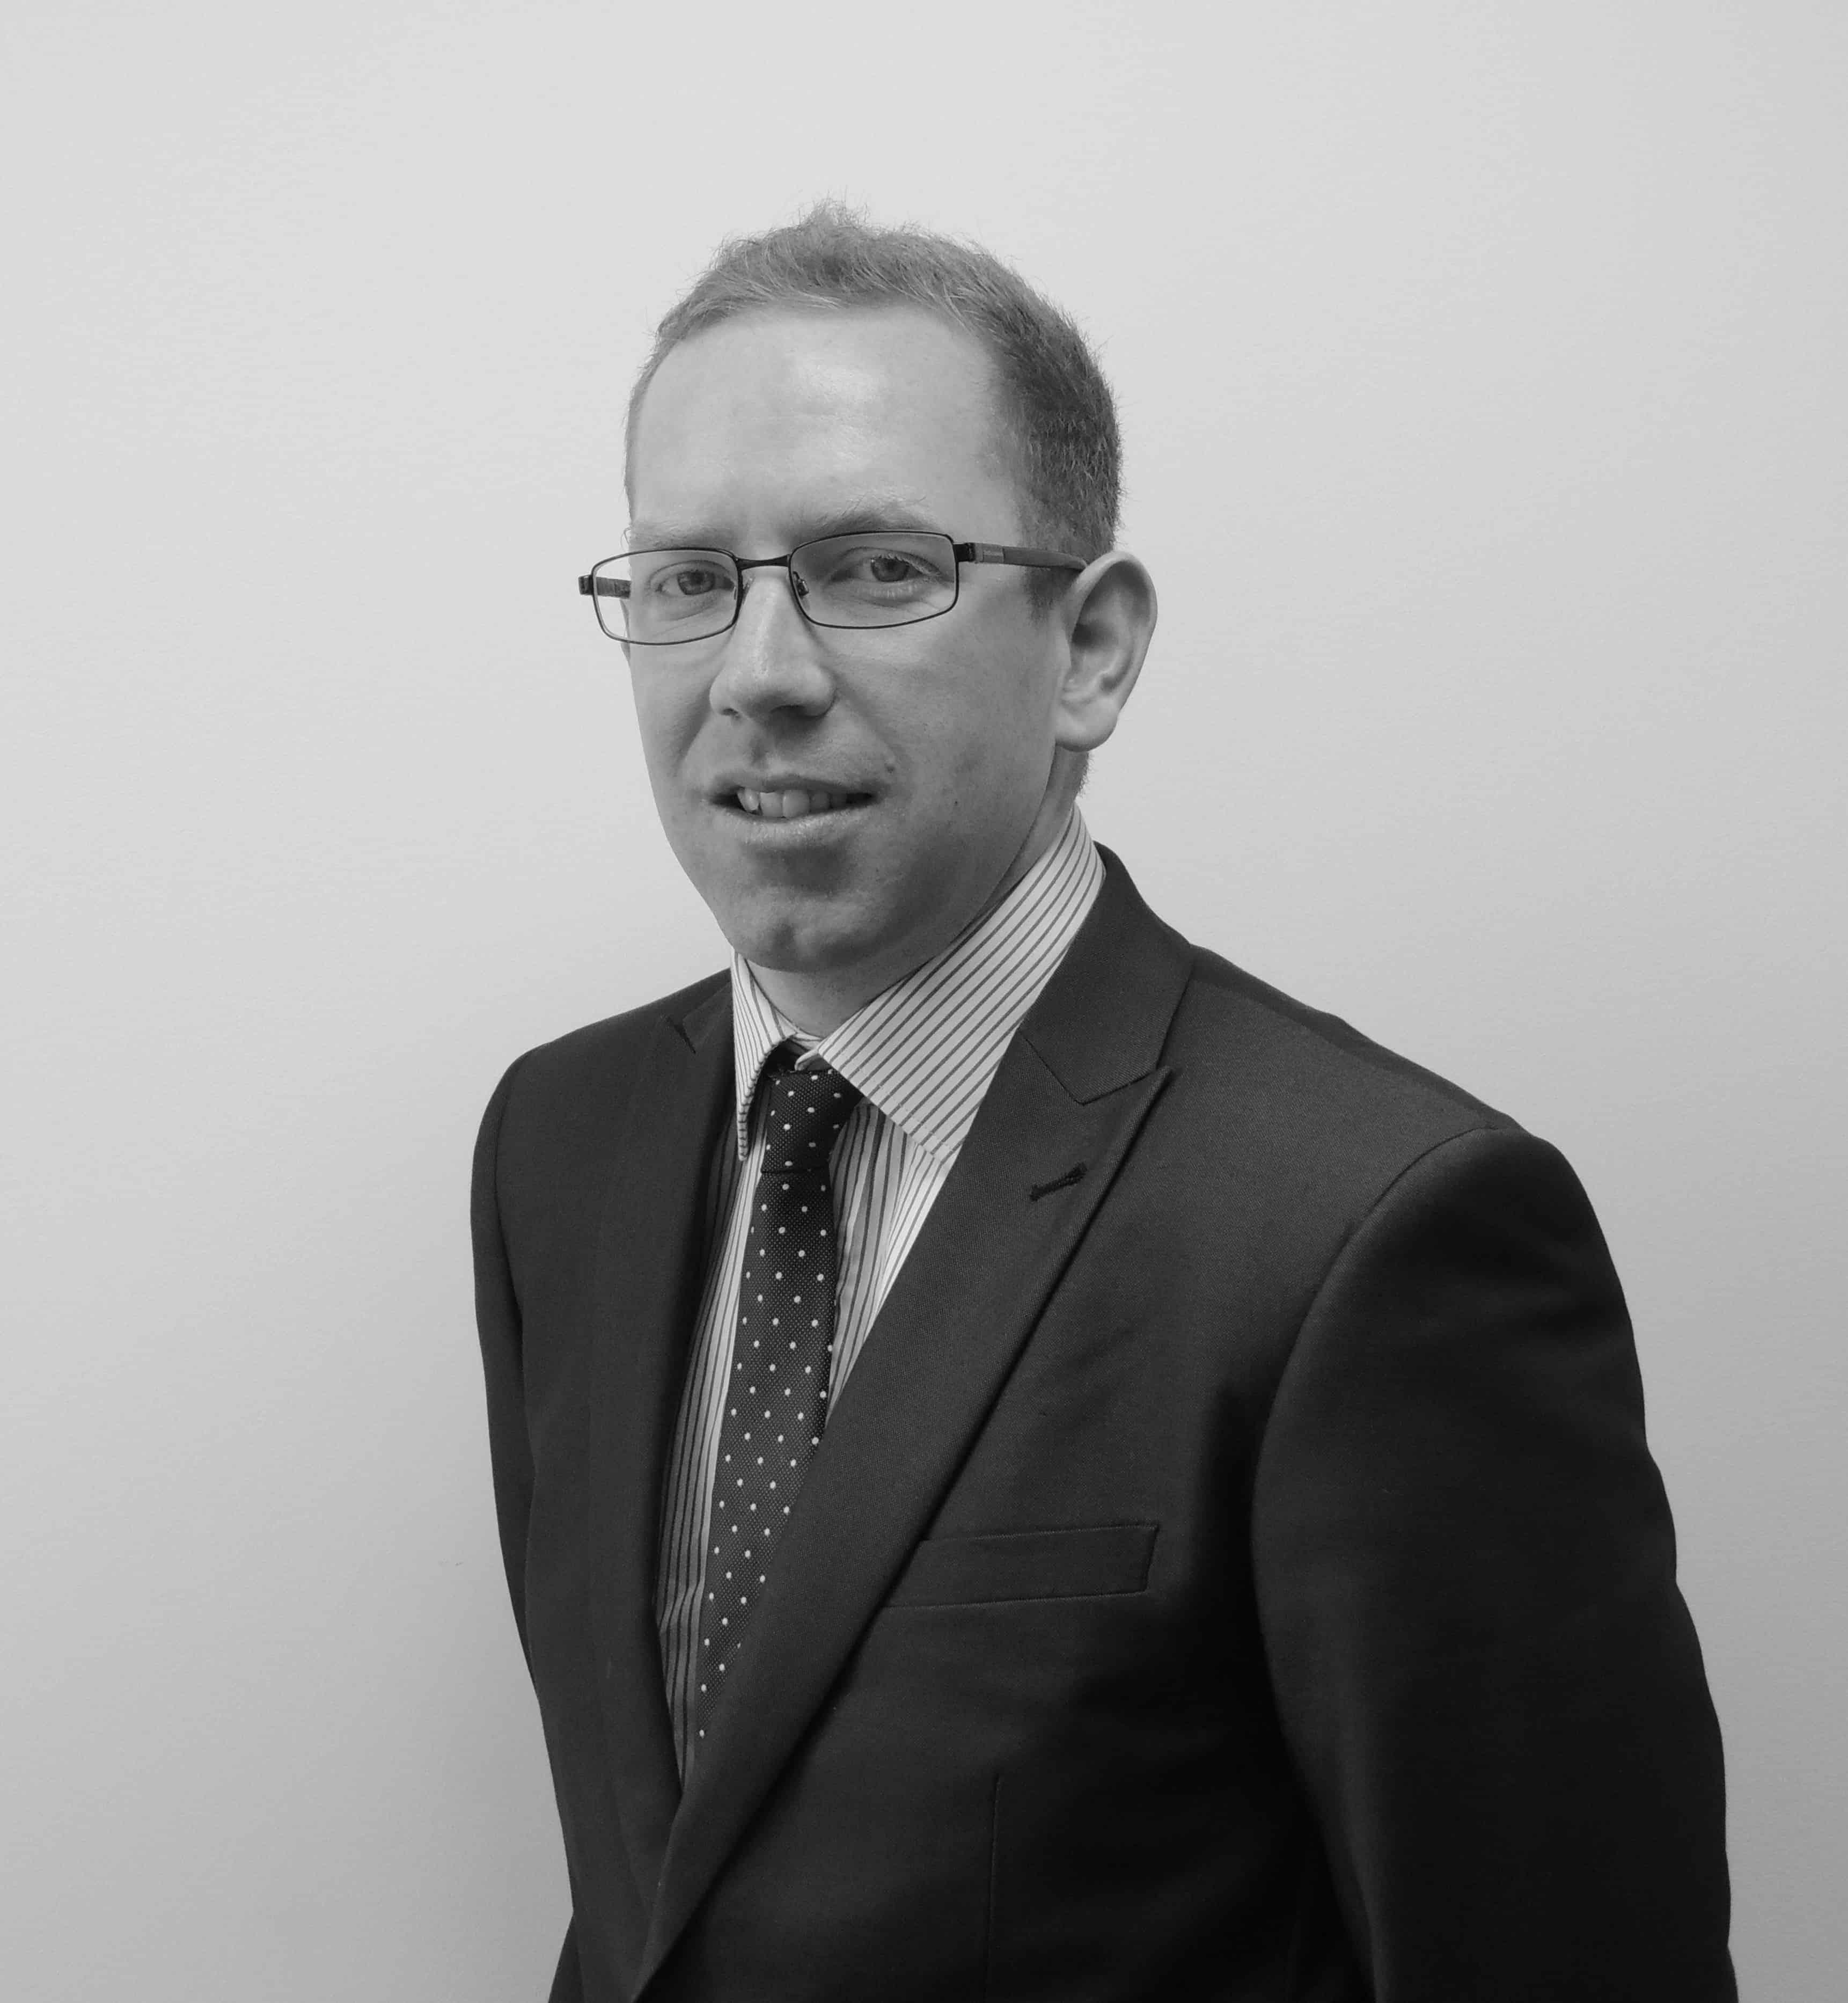 Photo of Chris Lock, Accountant at Aston Shaw